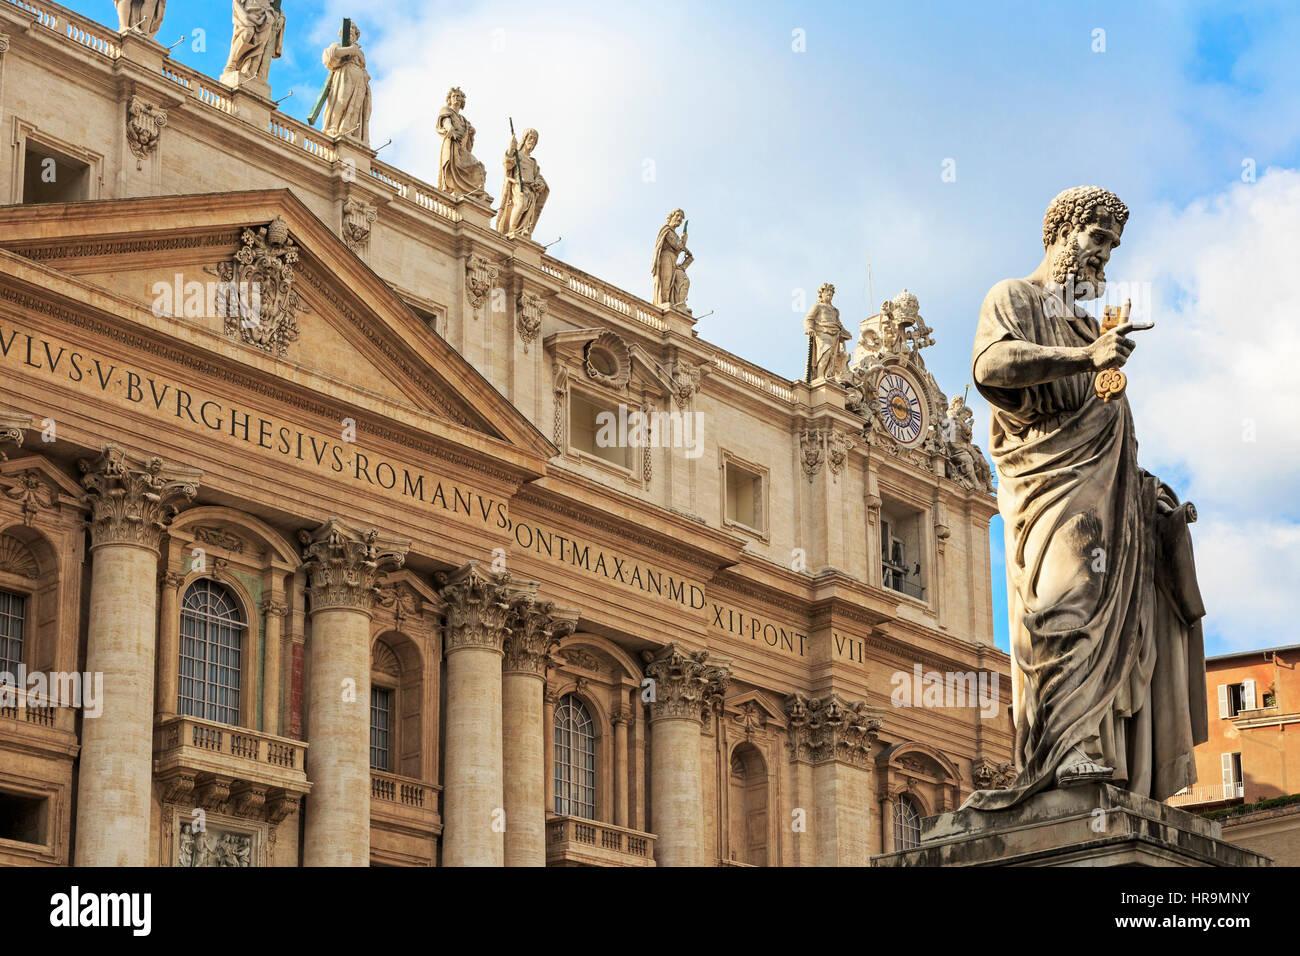 Papal balcony at Saint Peters Basilica, Vatican, Rome, Italy - Stock Image